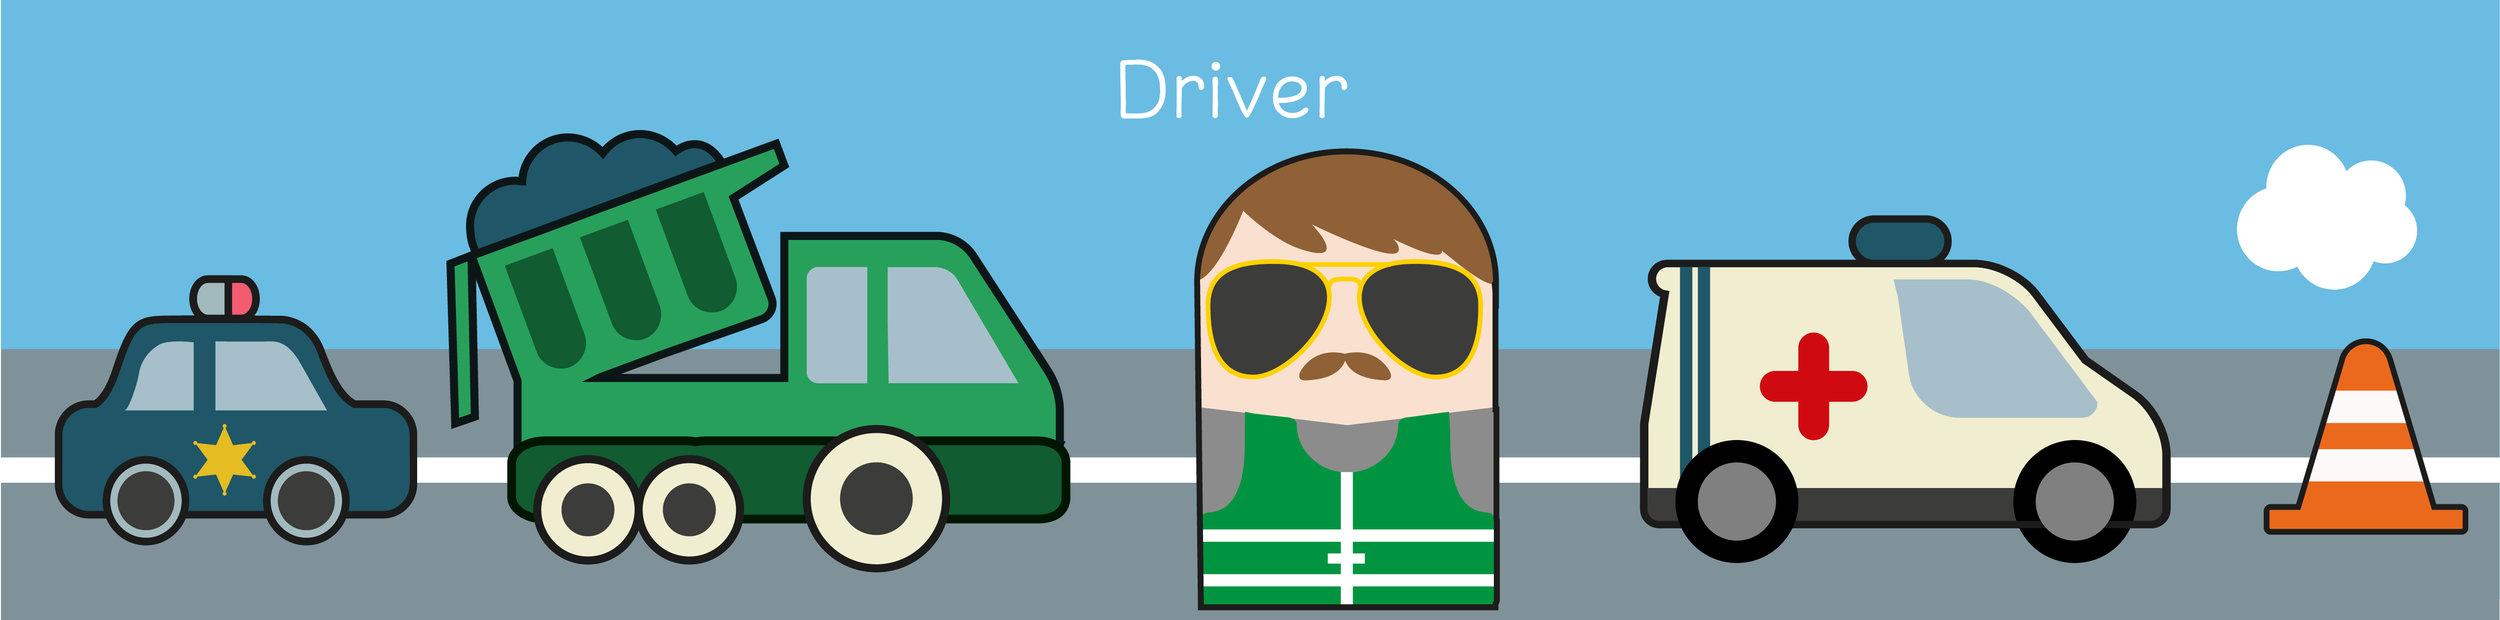 banner-driver